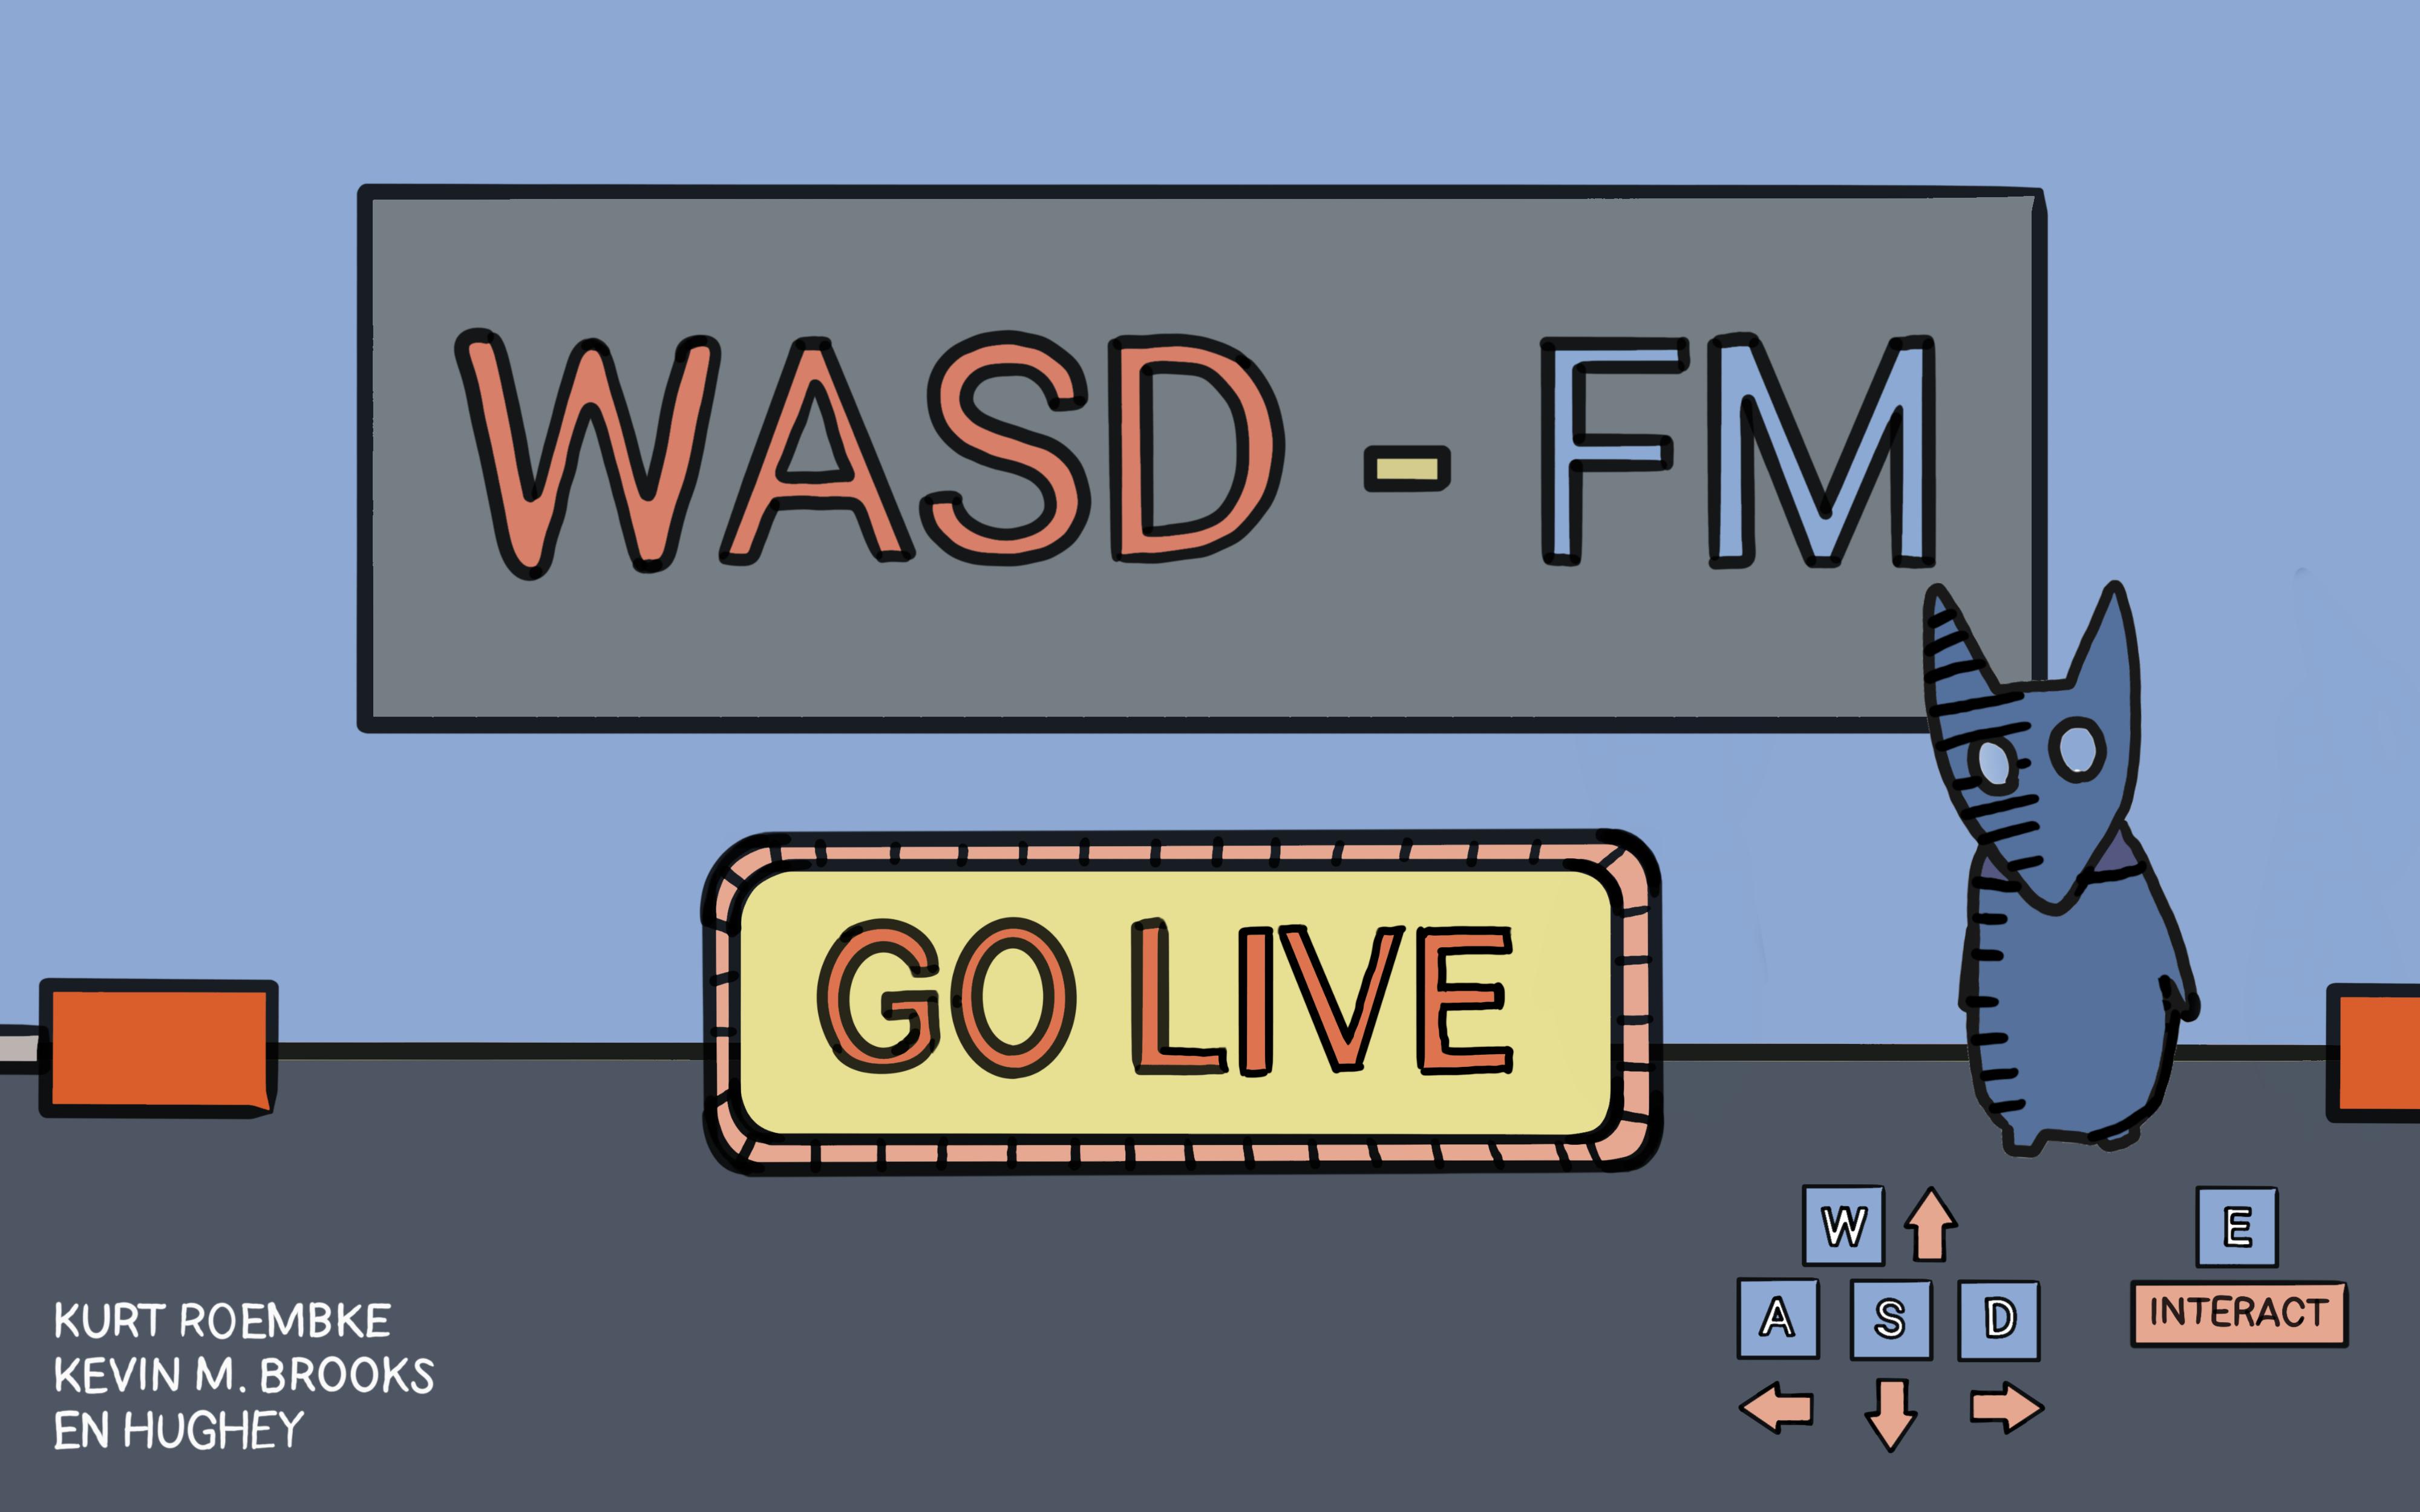 WASD-FM